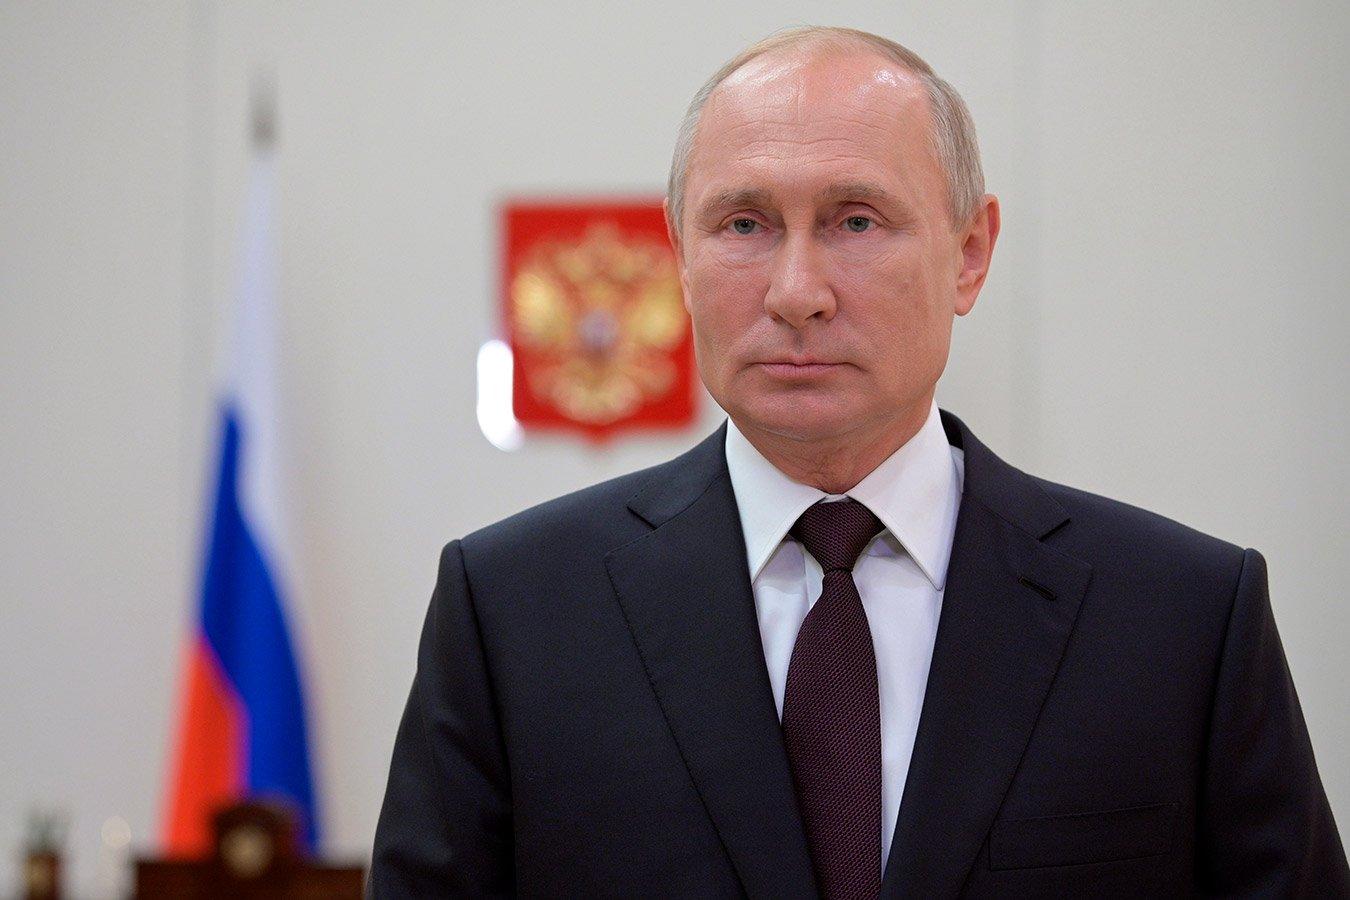 Владимир Путин отреагировал на победу Даниила Медведева в финале US Open — 2021